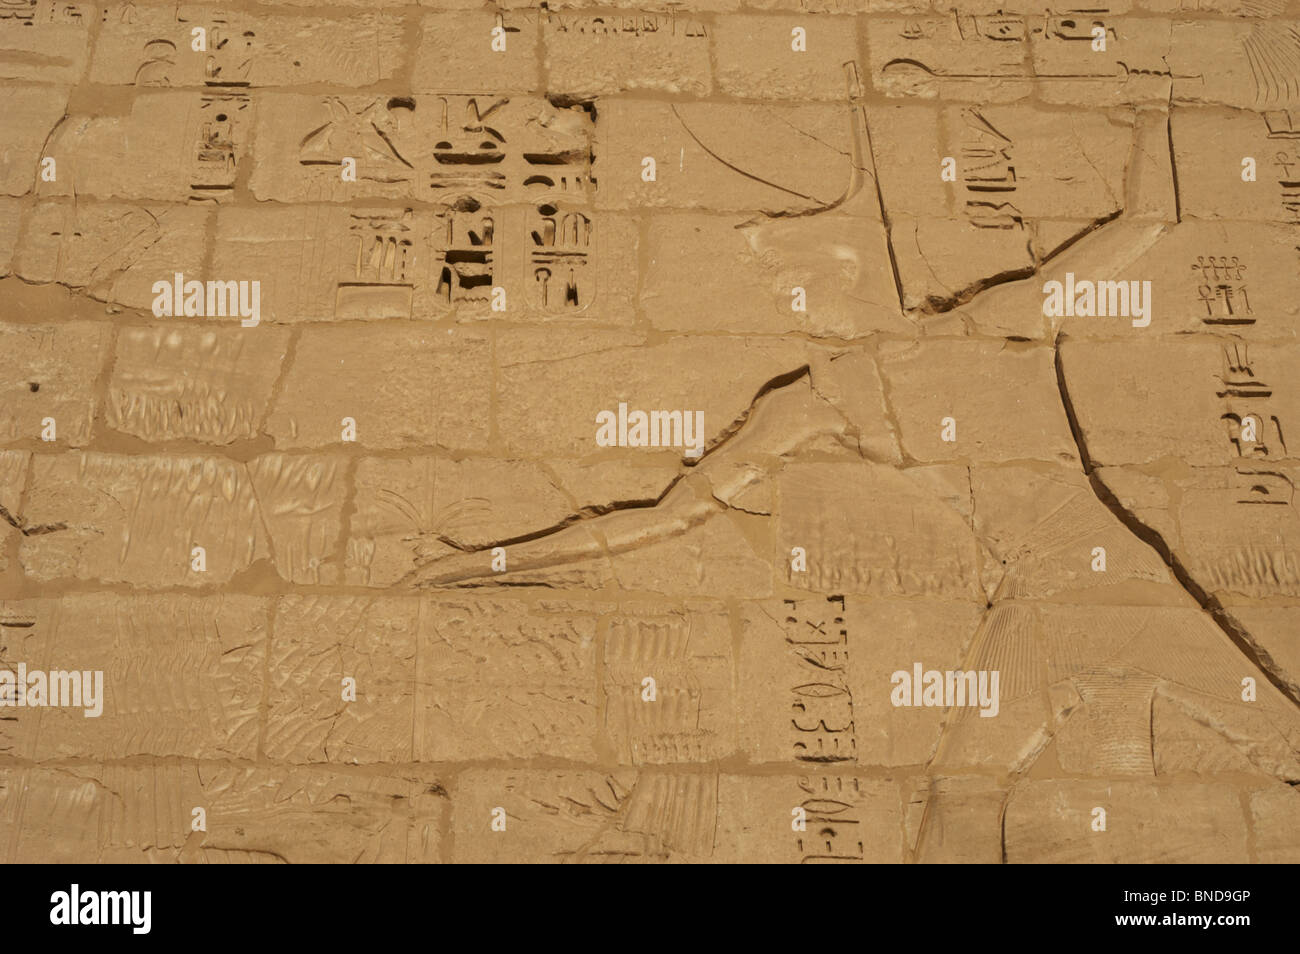 Temple of Ramses III. Relief depicting Ramses III capturing his enemies before Ra-Horajti. Detail of the pharaoh. - Stock Image